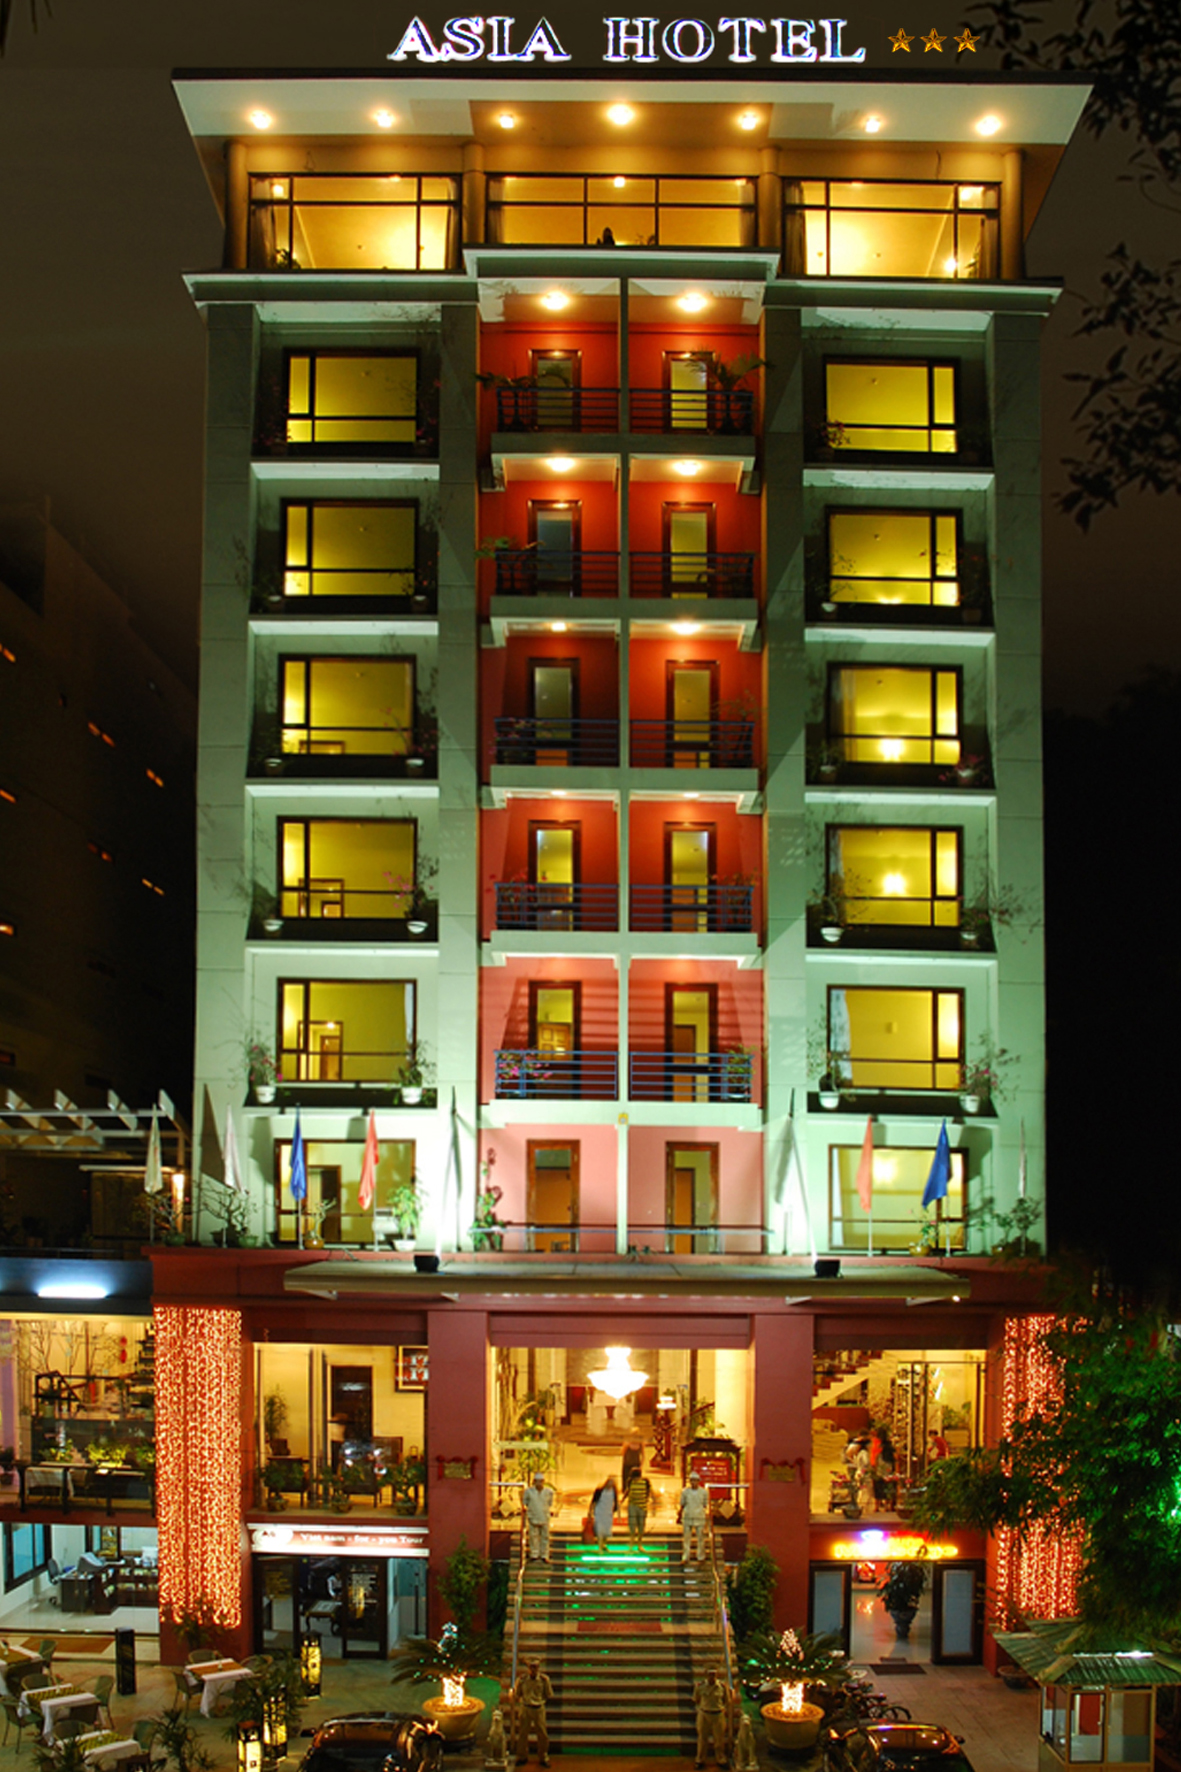 Asia Hotel Hue Hue Discount Rates At Asia Hotel Hue